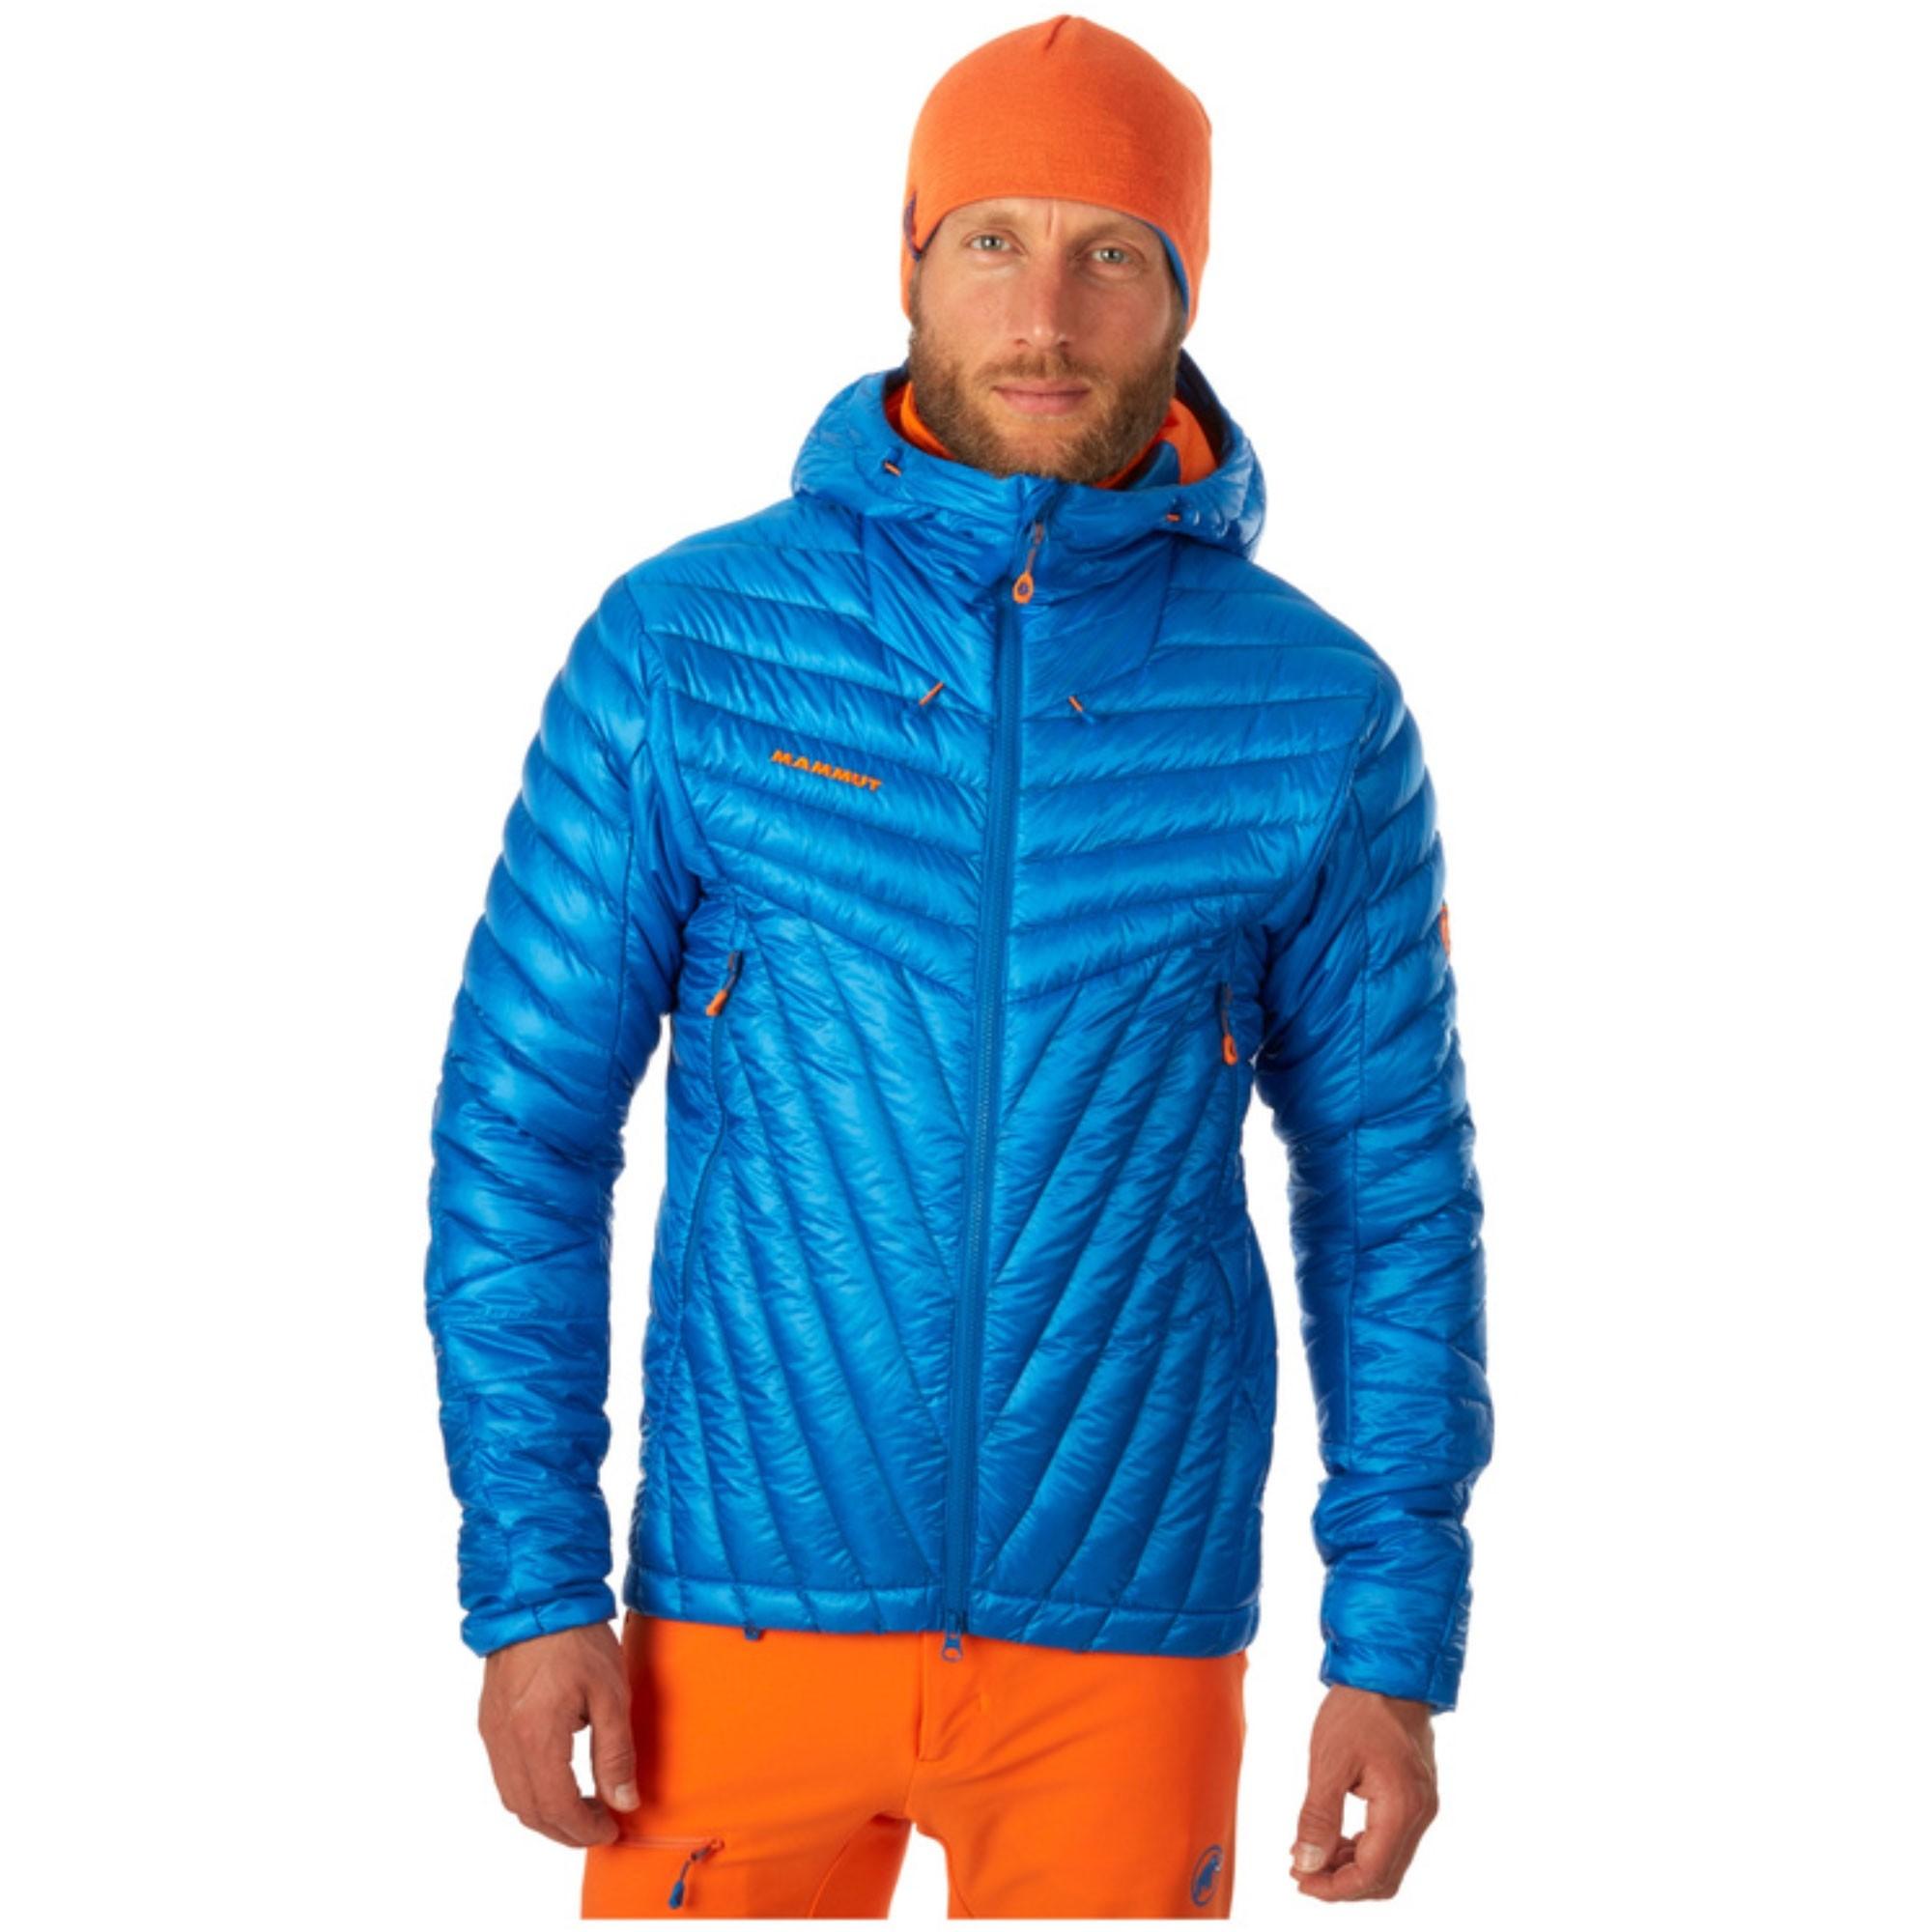 Mammut Eiger Extreme Eigerjoch Advanced IN Hooded Jacket - Ice